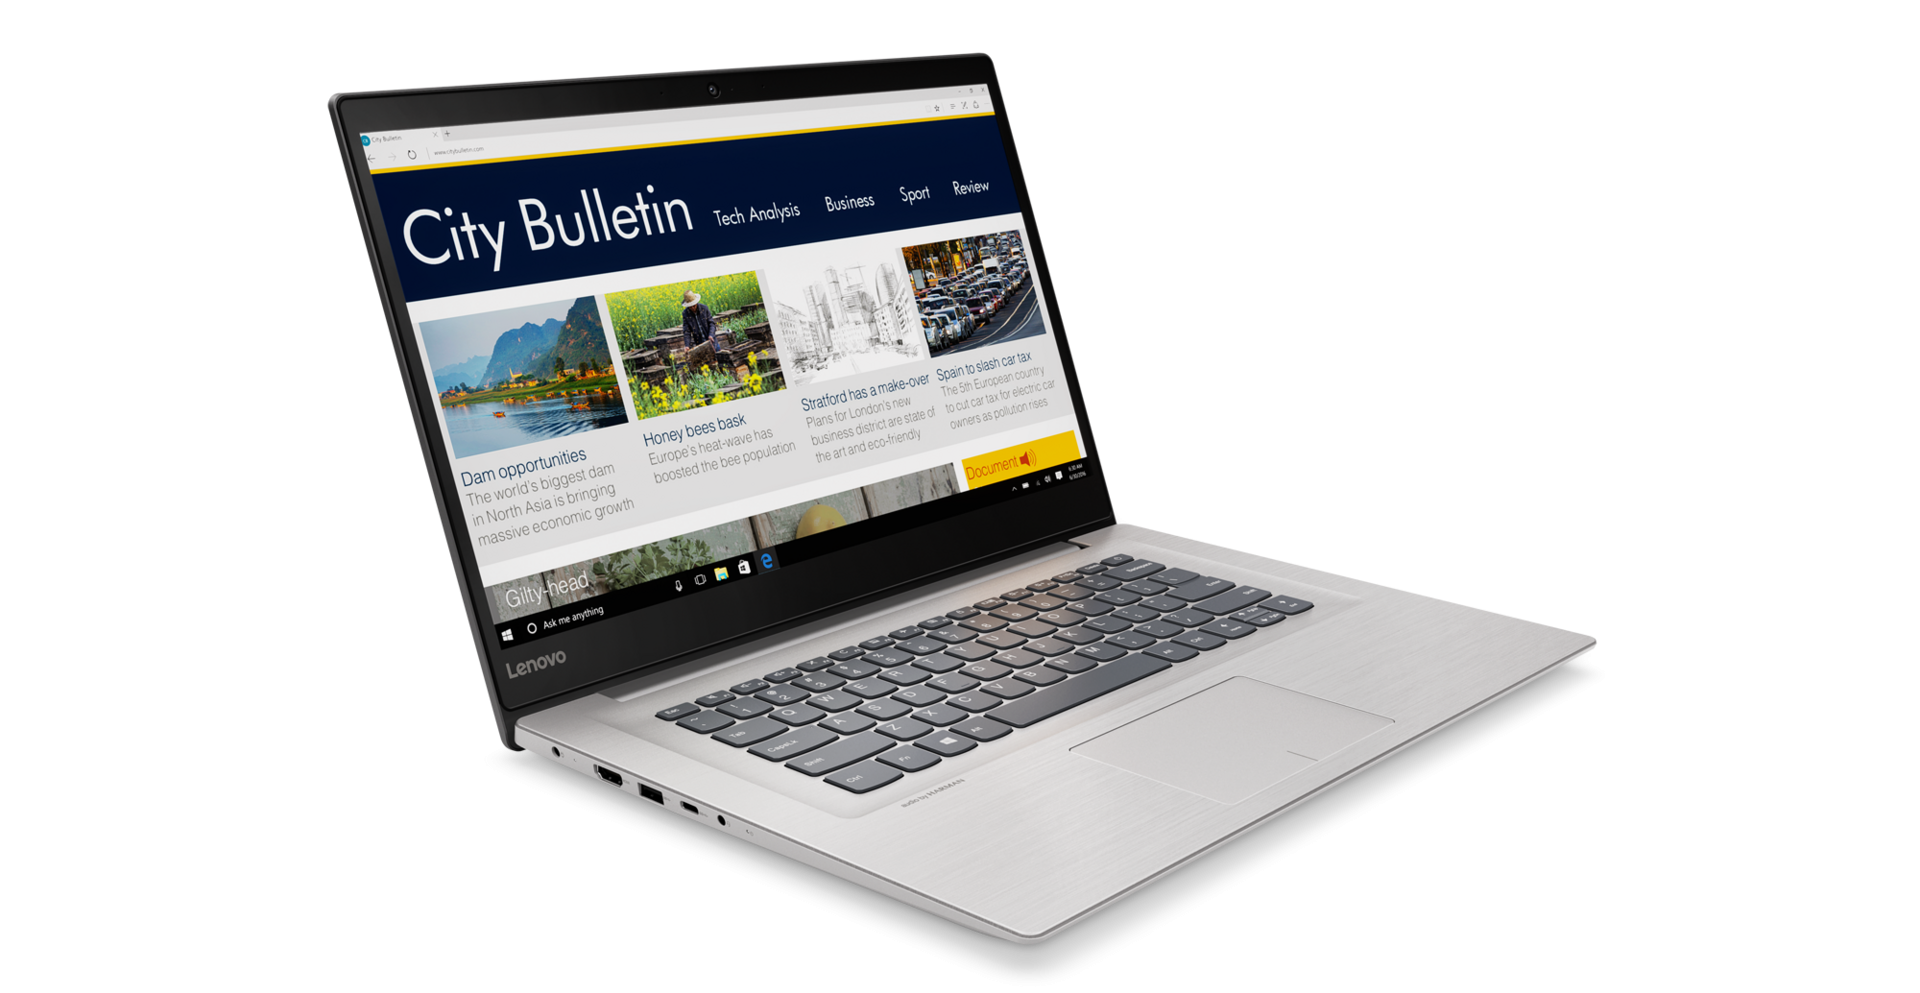 Lenovo budget laptop